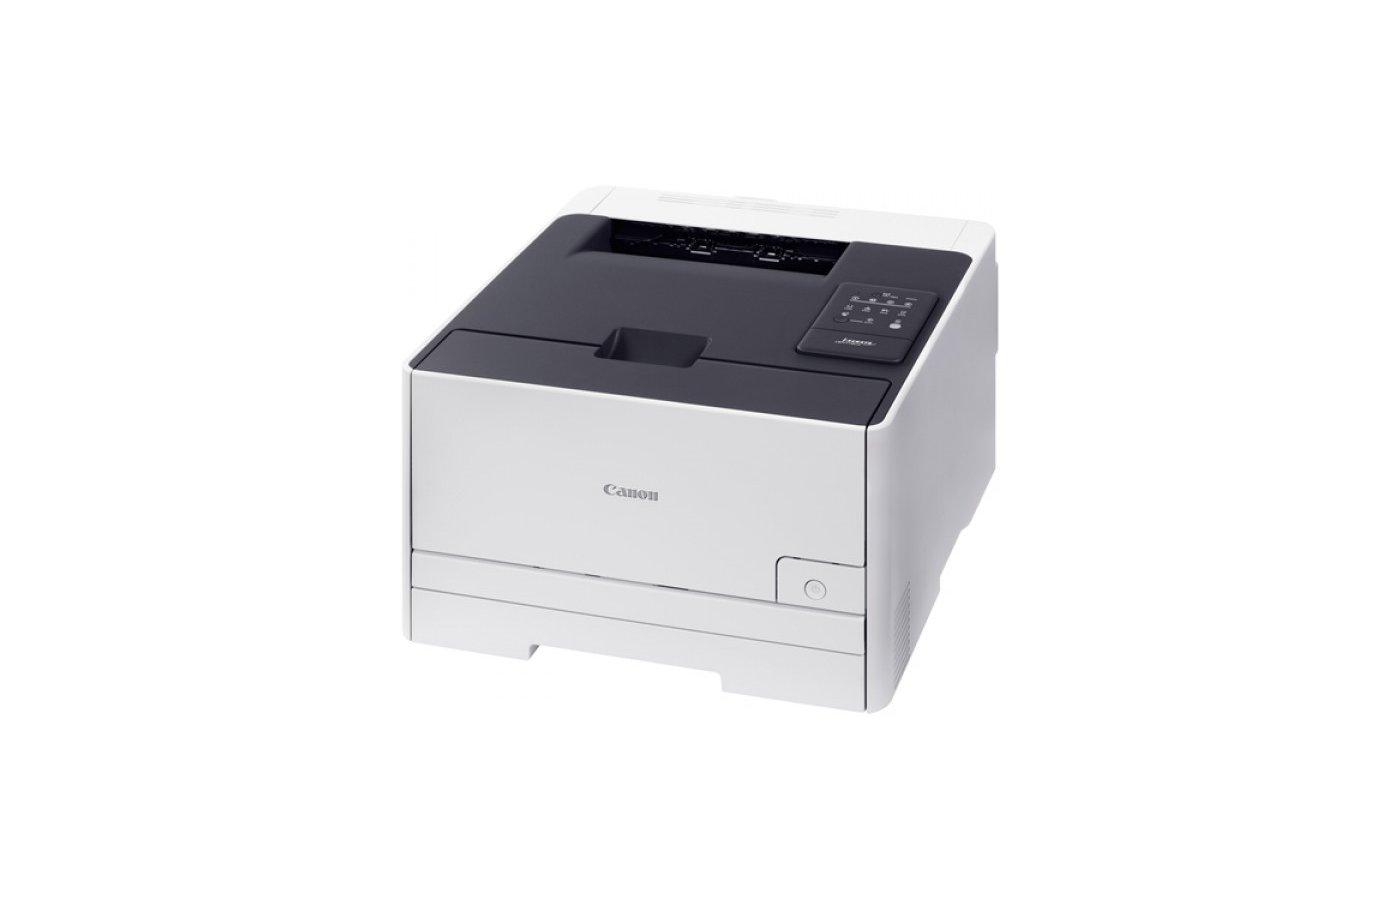 Принтер Canon i-Sensys Colour LBP7110Cw